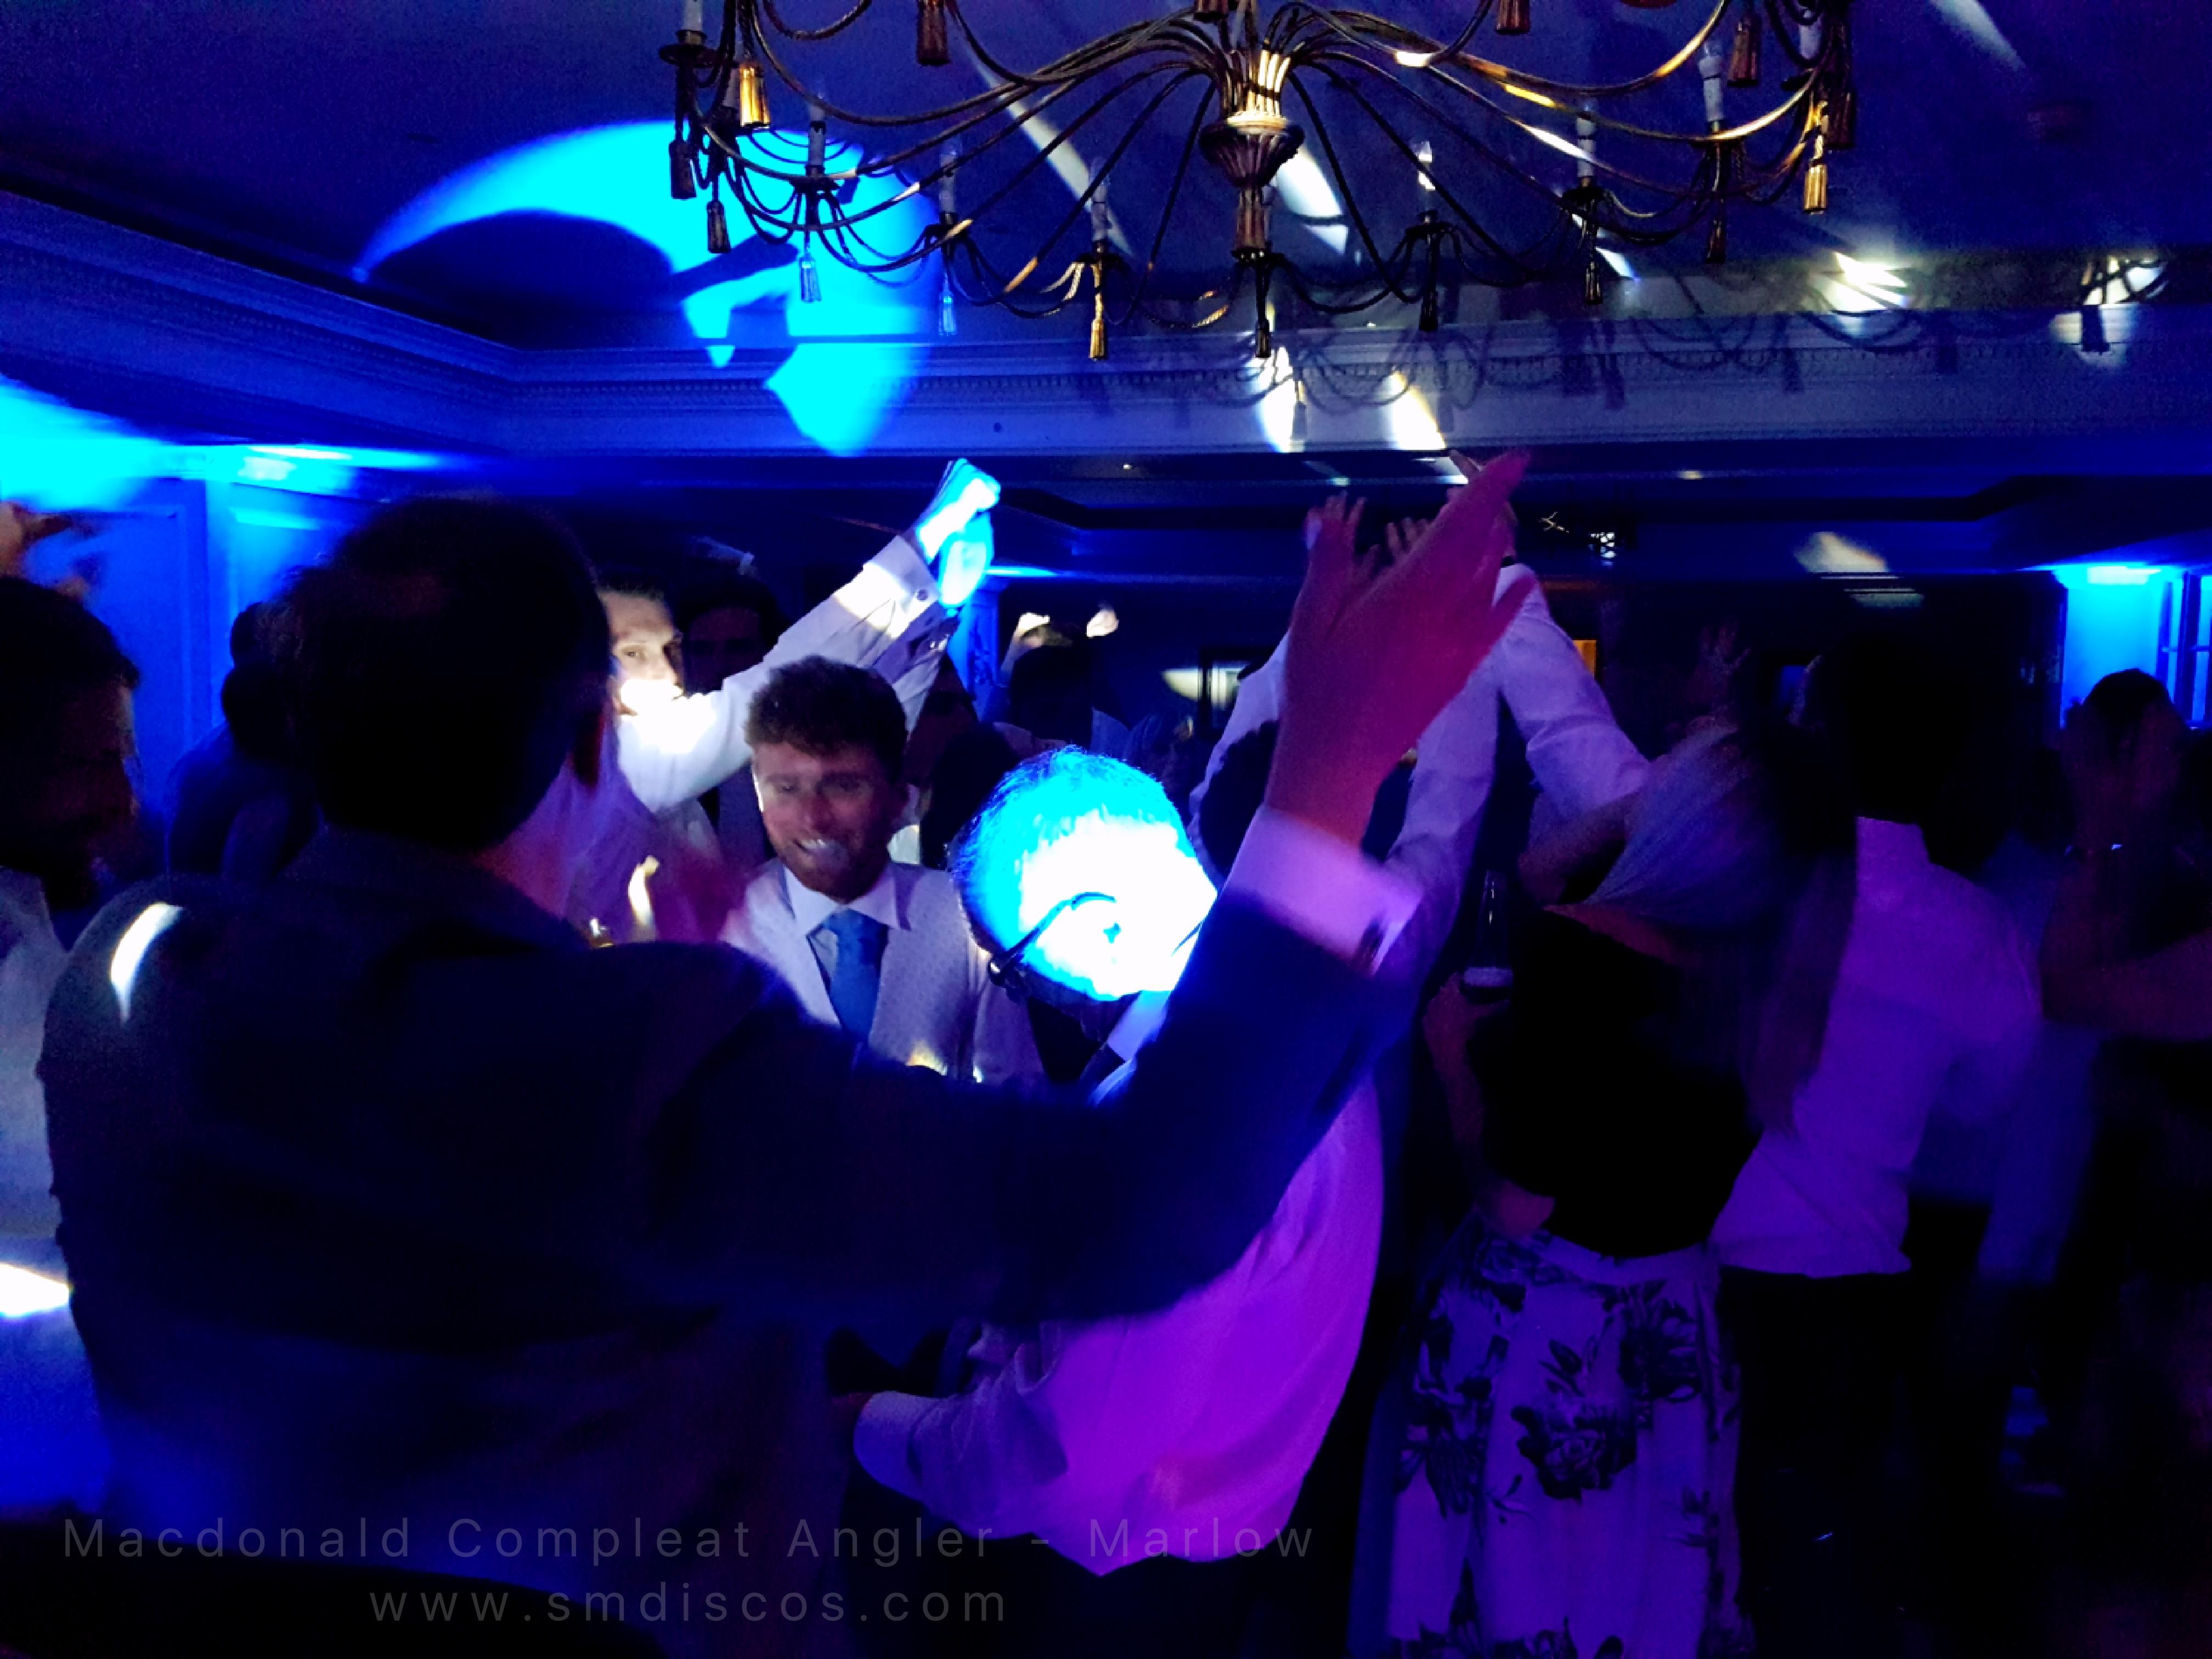 Maidenhead Marlow Wedding DJ